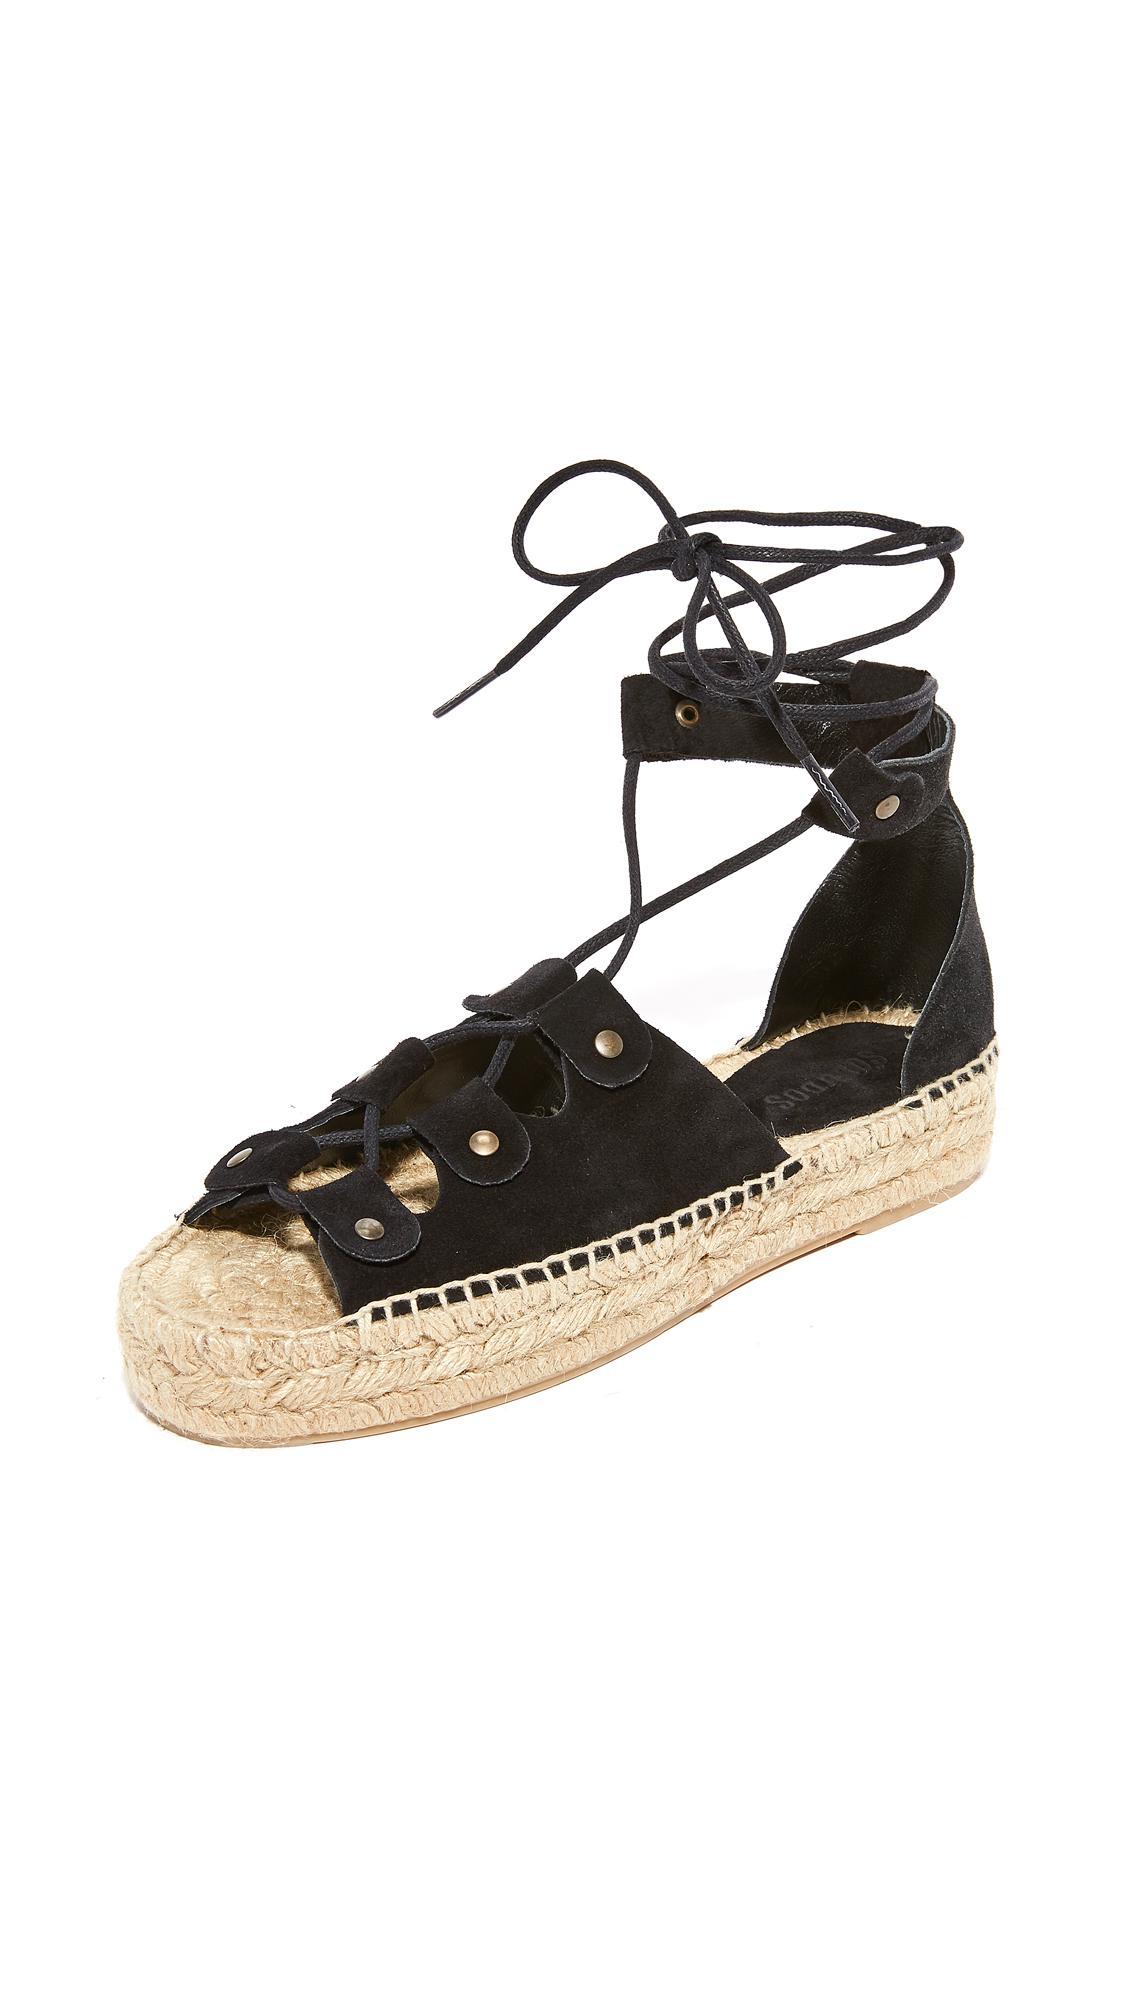 7c3ce50ae69d Soludos Ghillie Platform Sandals in Black - Lyst